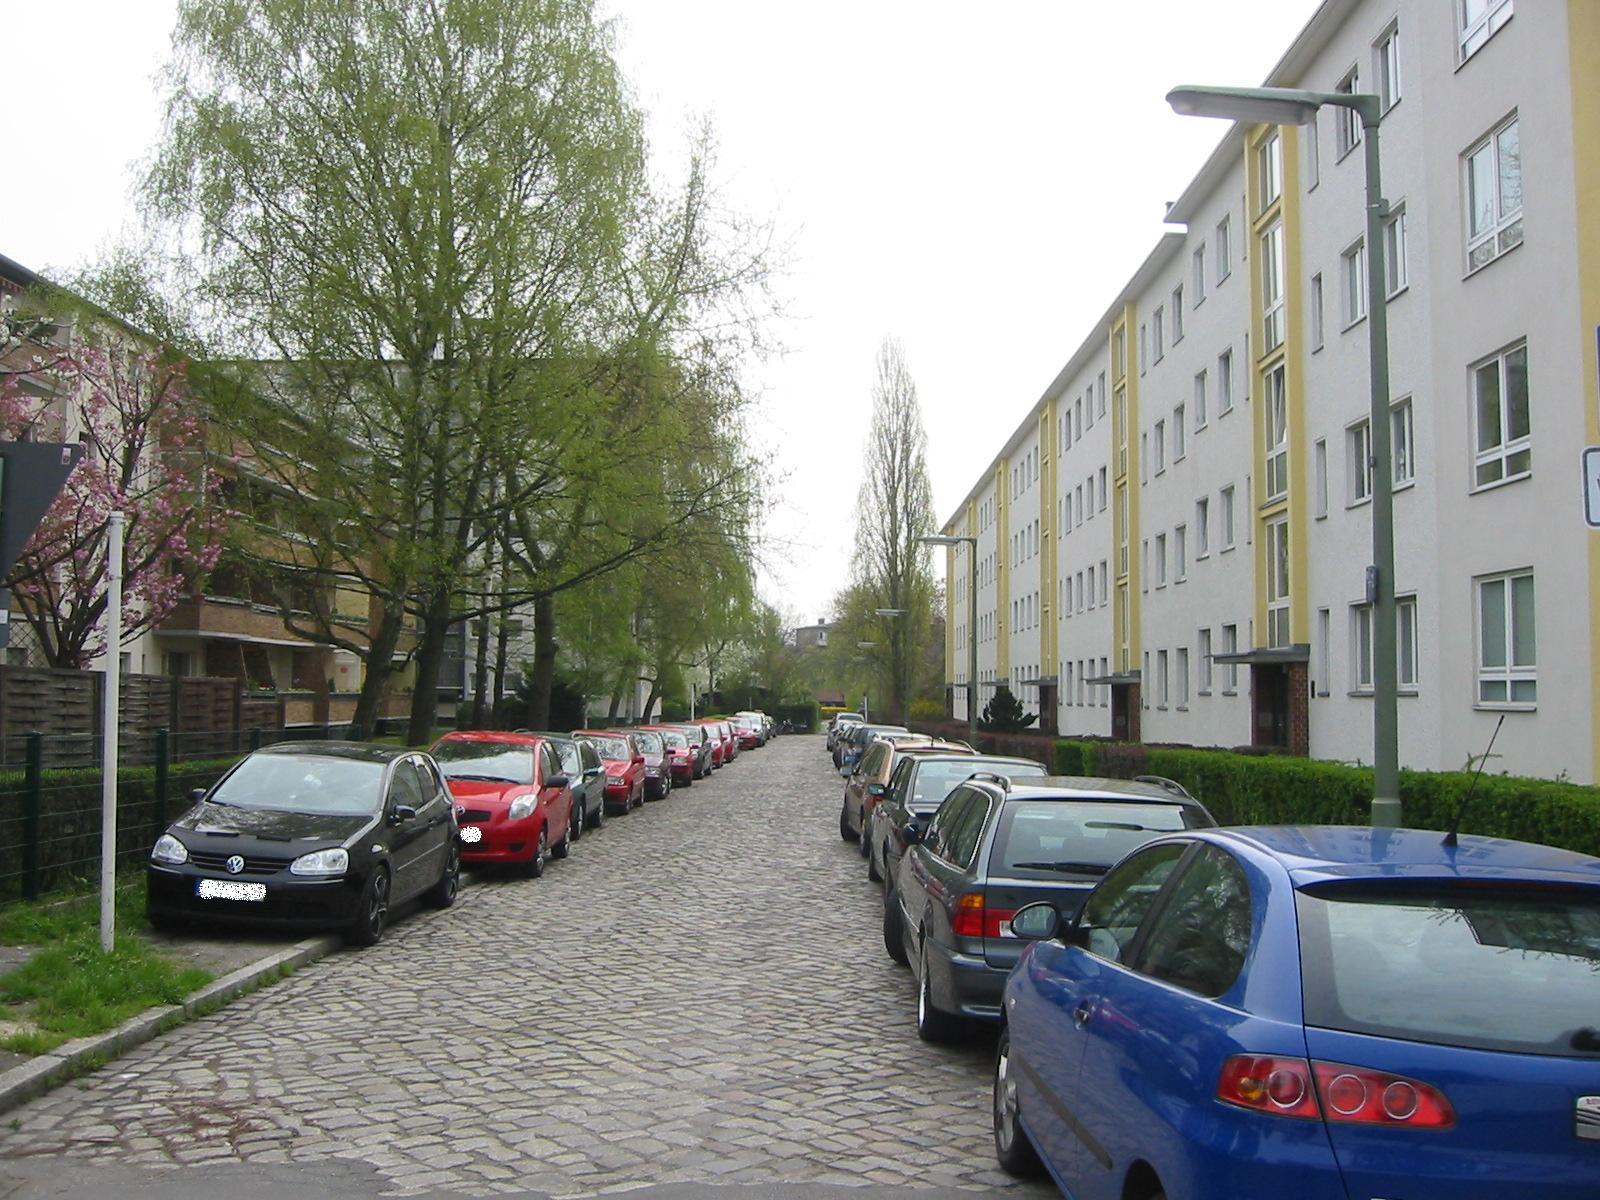 file berlin tempelhof ingostra wikimedia commons. Black Bedroom Furniture Sets. Home Design Ideas